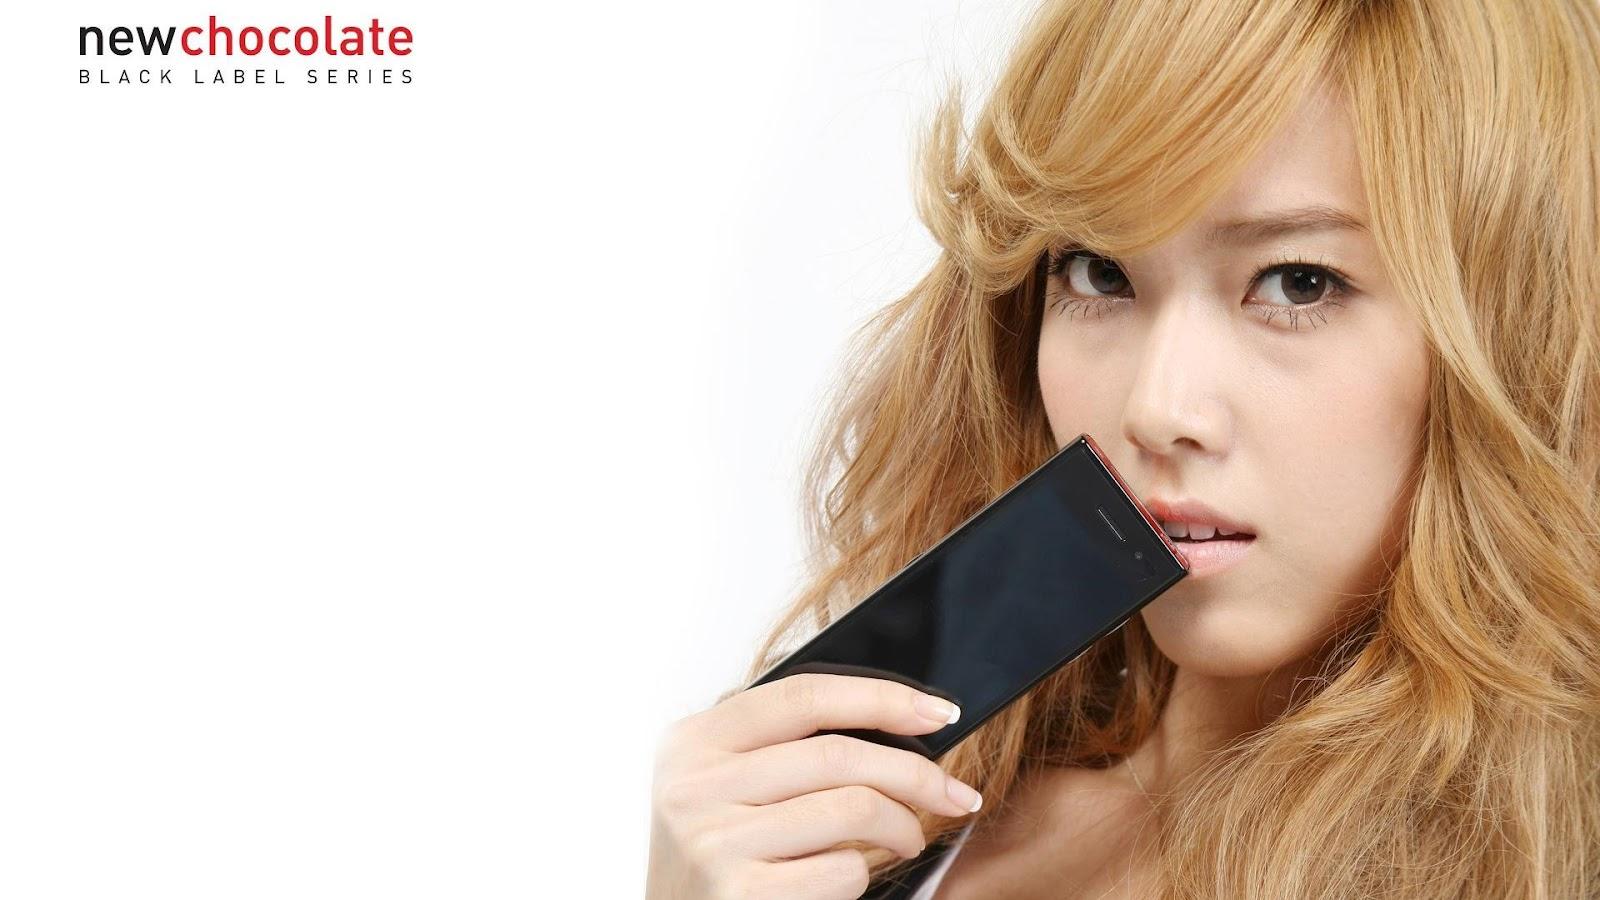 http://1.bp.blogspot.com/-2SvpDW9pM68/UBvrBFaT75I/AAAAAAAAJrg/UyODj4dCEws/s1600/celebrity-wallpaper-snsd-jessica-love-1080x1920.jpg